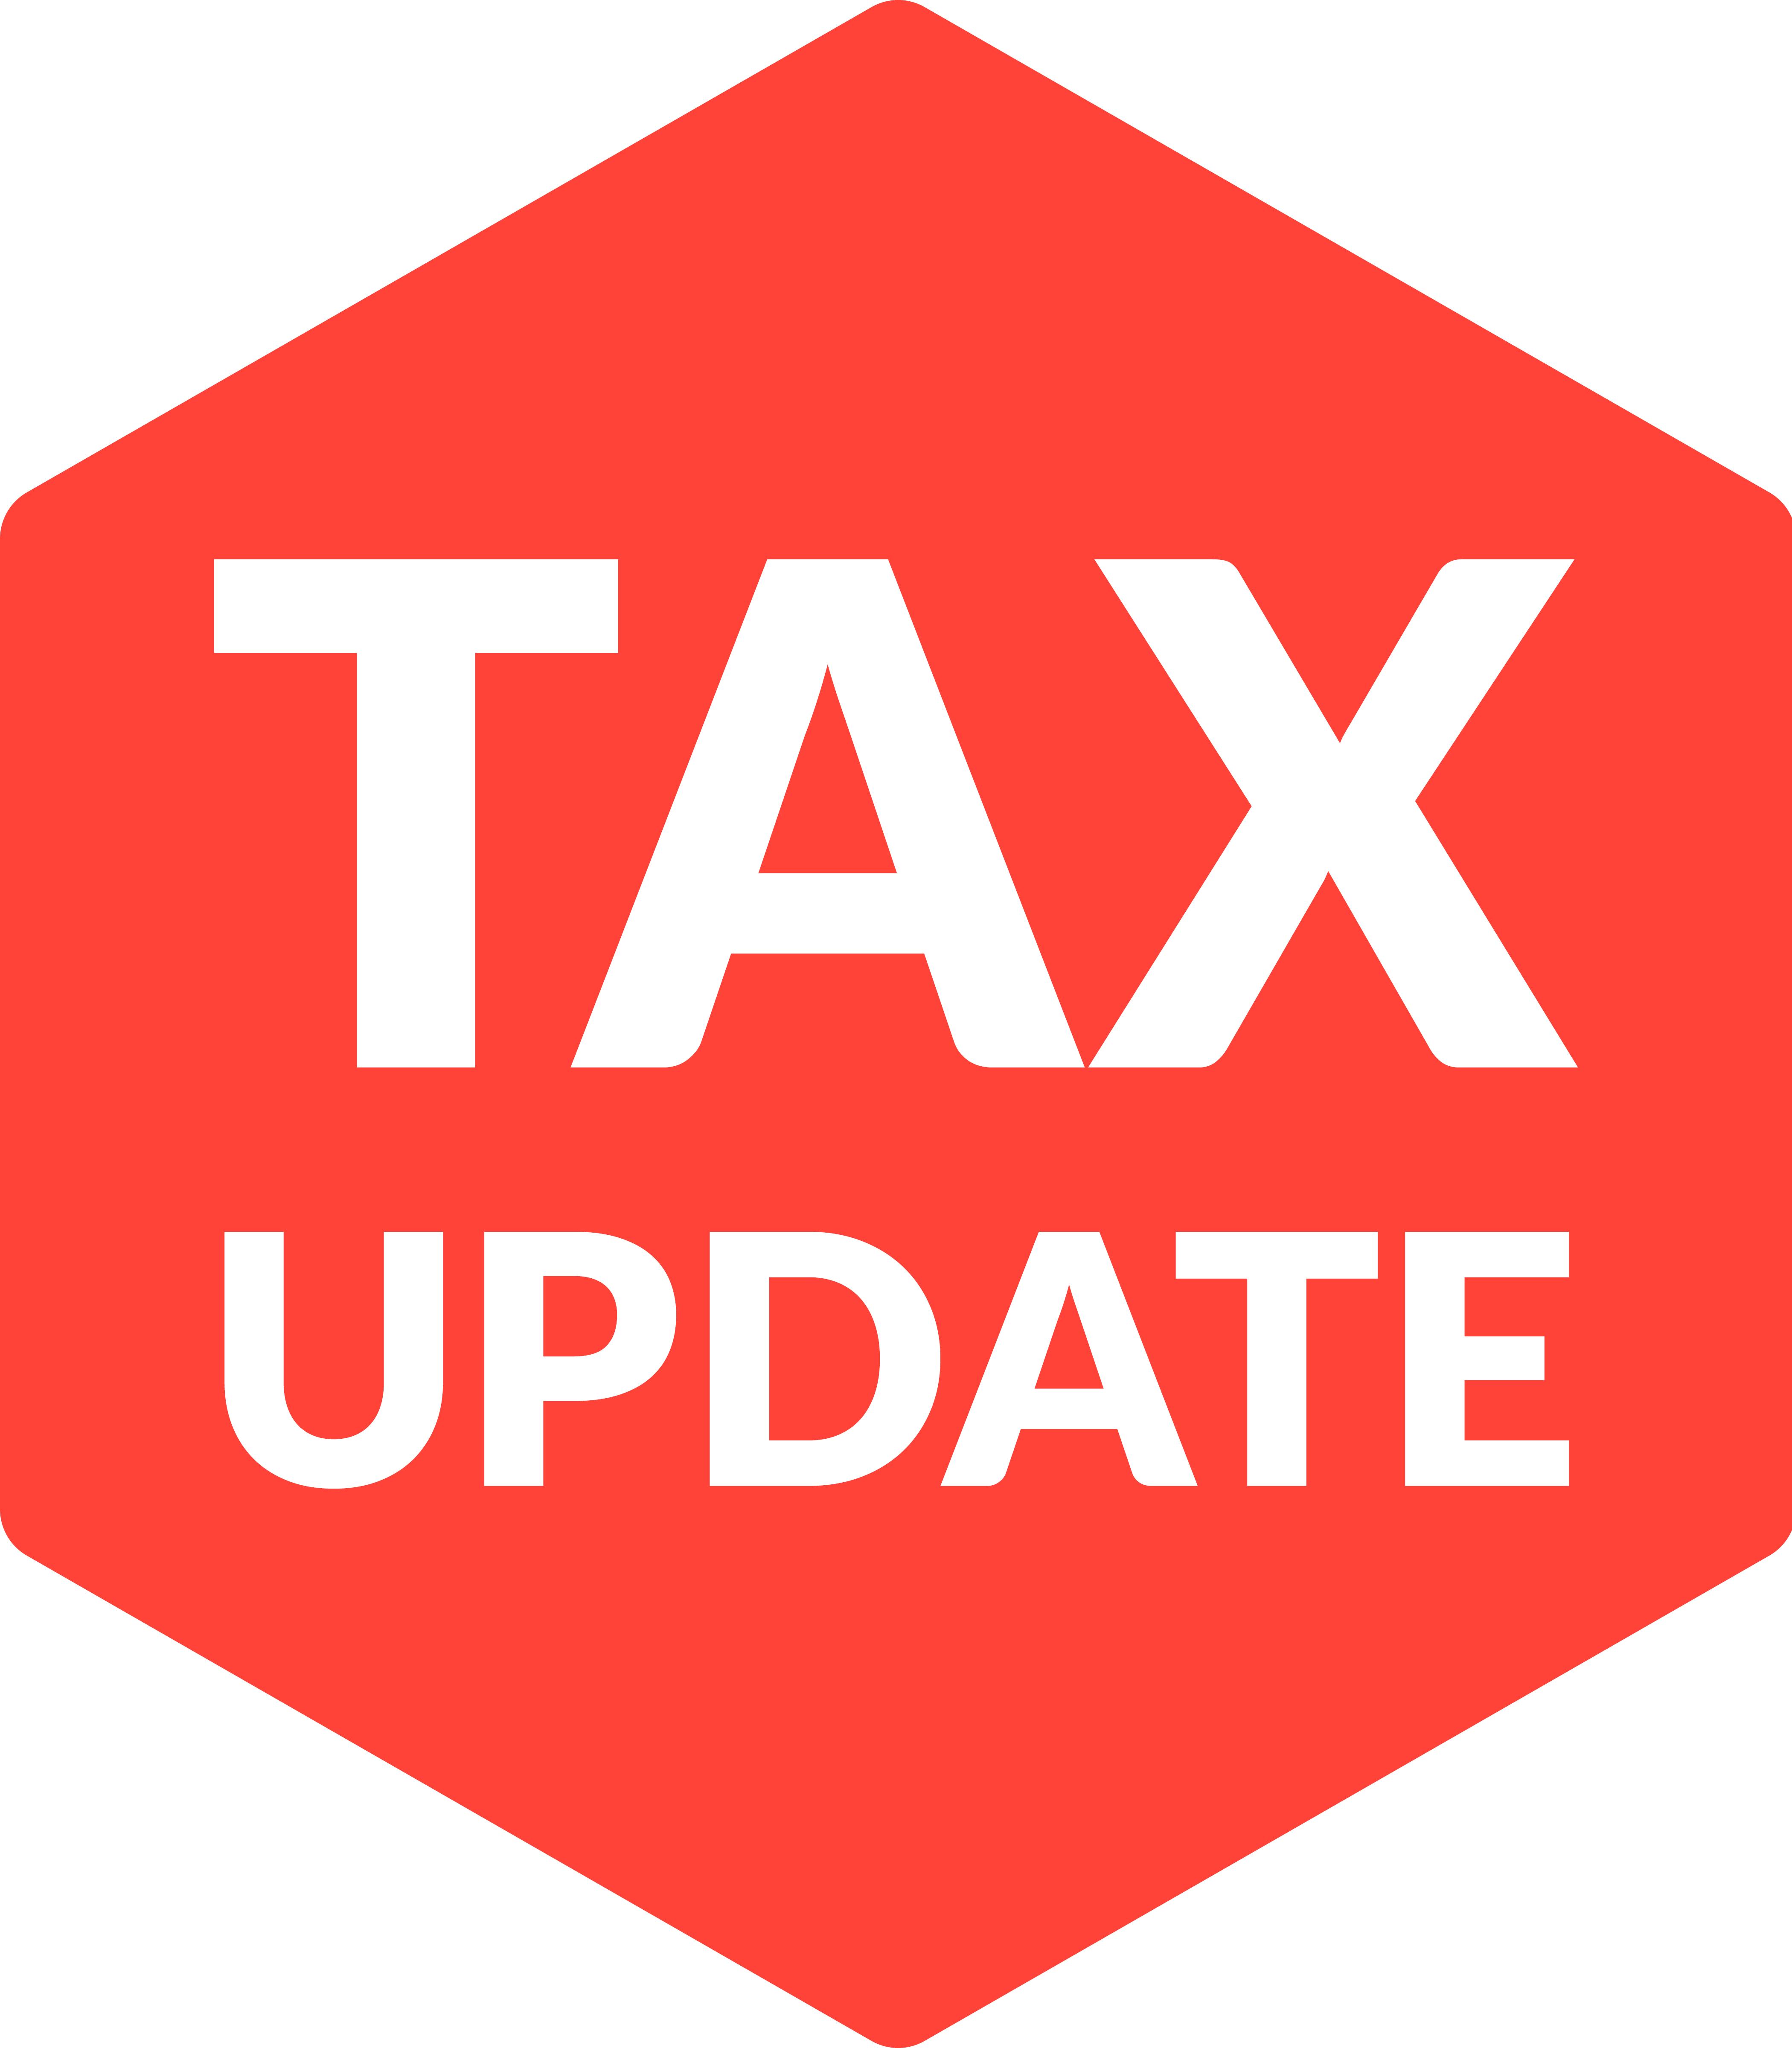 Tax Update Branding